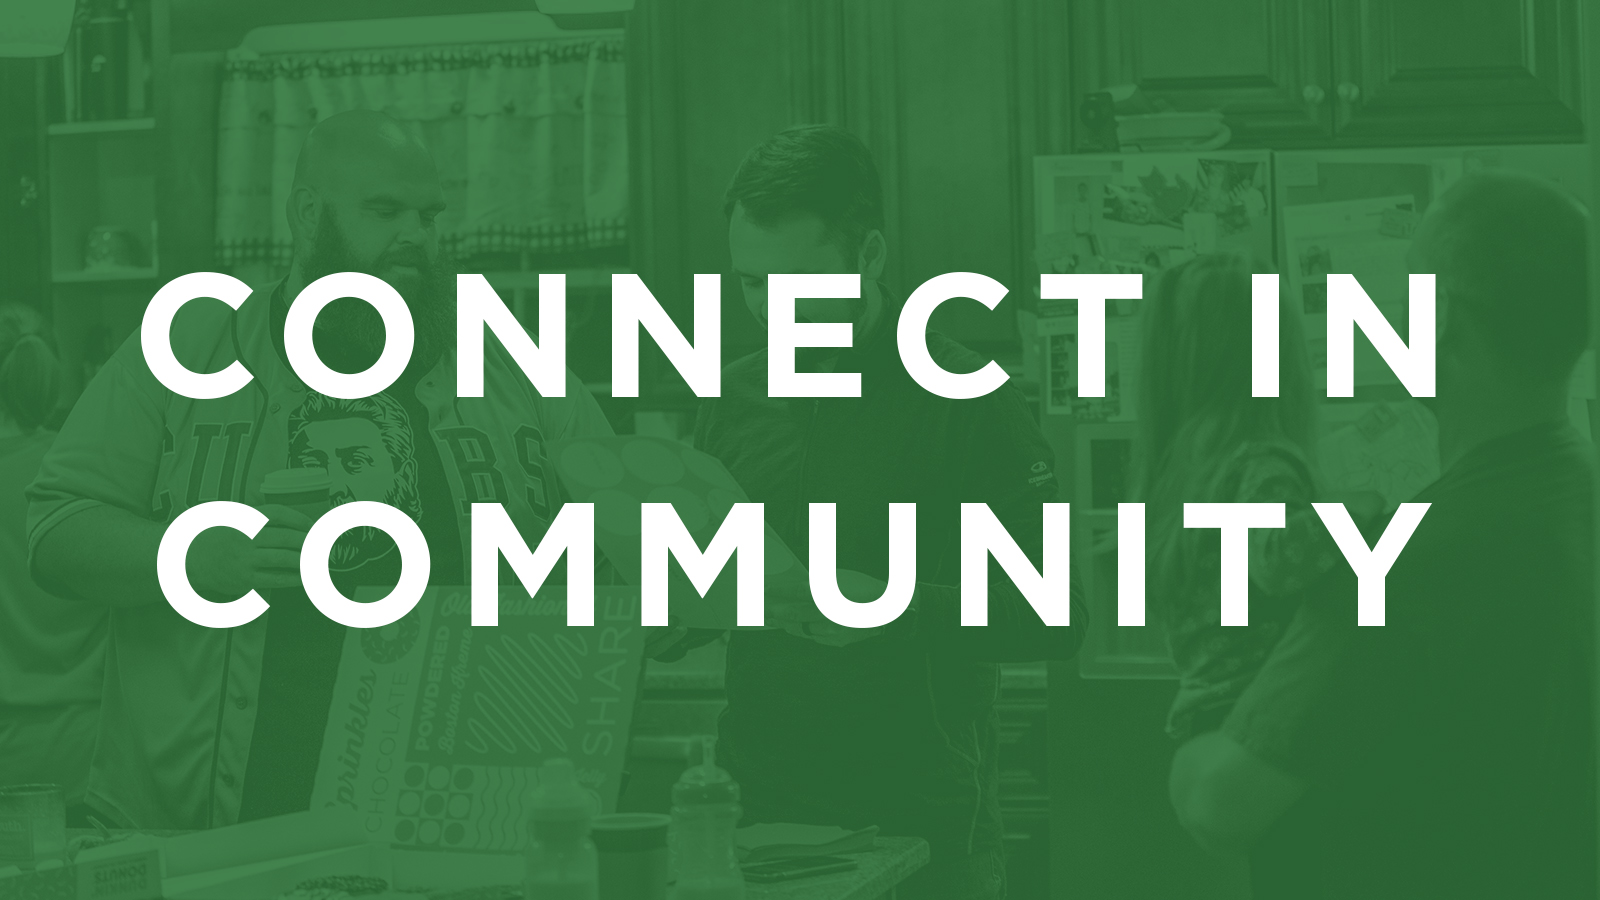 ConnectInCommunity.jpg